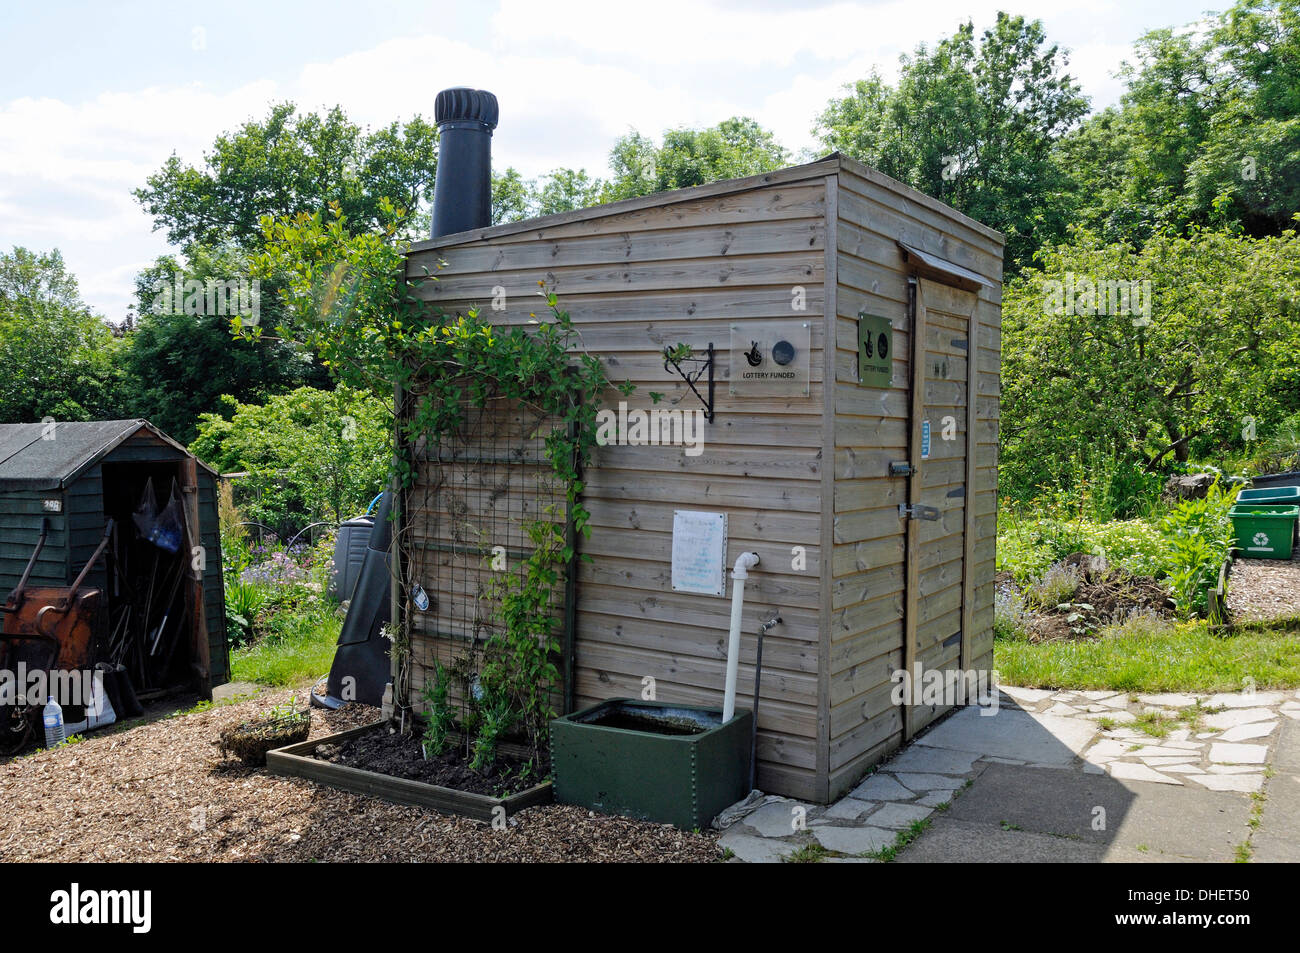 Compost Toilet Stock Photos & Compost Toilet Stock Images - Alamy